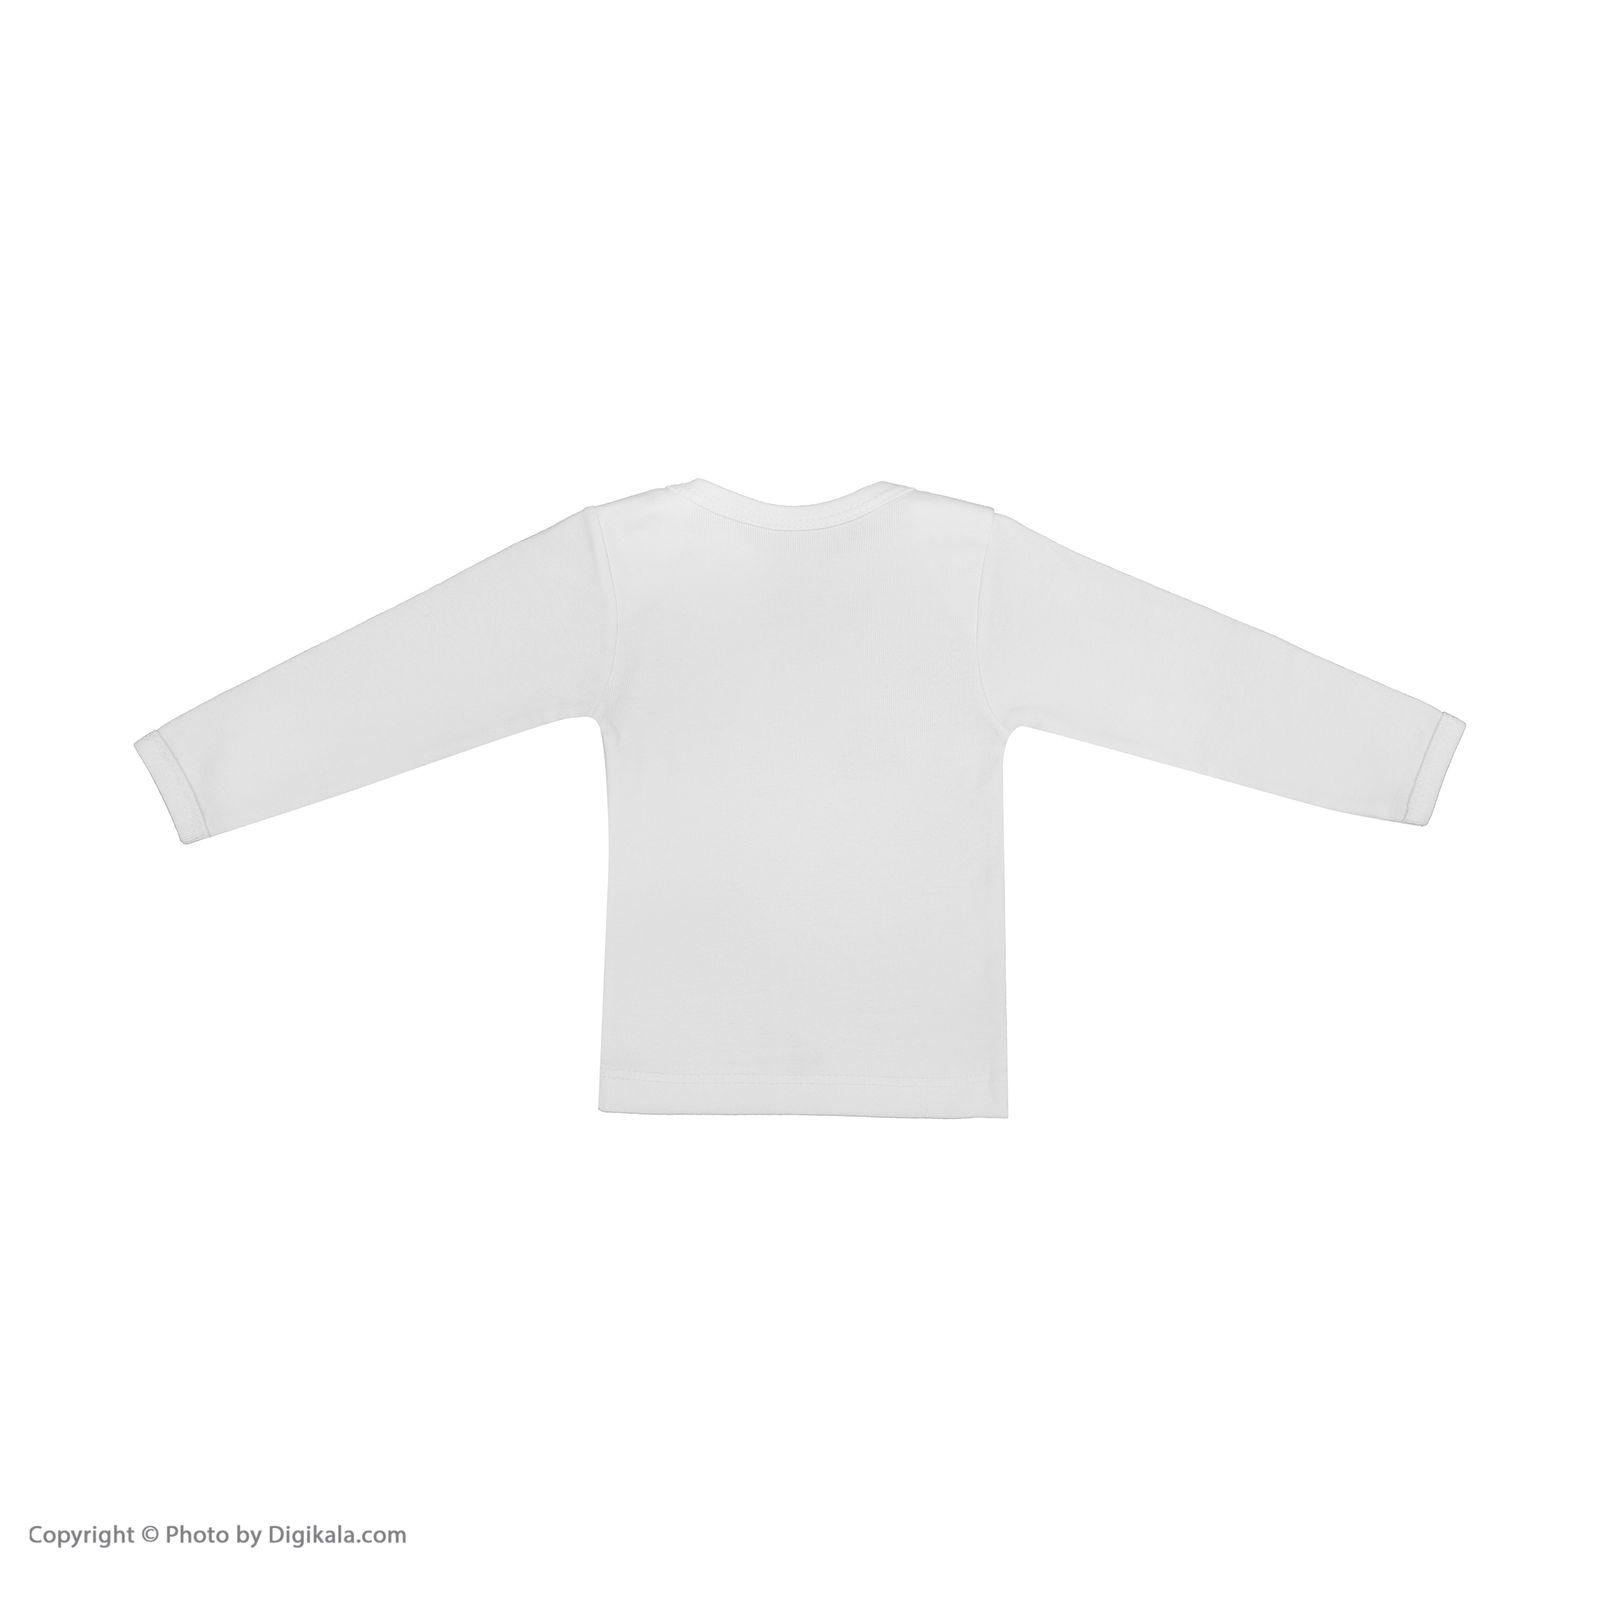 تی شرت نوزادی سون پون مدل 1391213-01 main 1 2